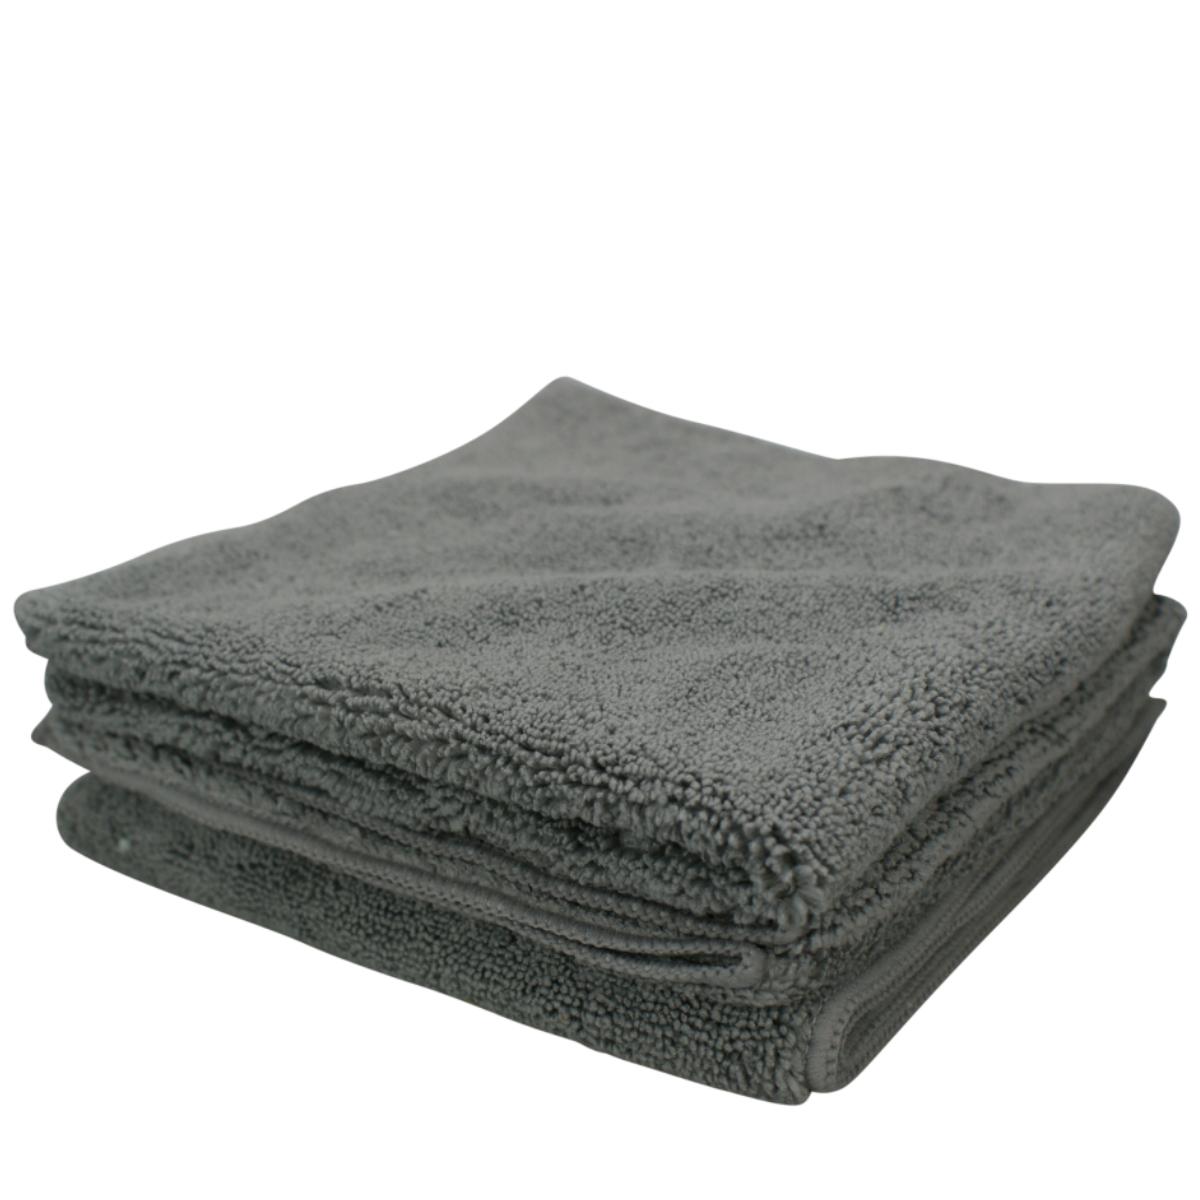 koch chemie bilateral microfasertuch 40 x 40 xm 3er set 789013. Black Bedroom Furniture Sets. Home Design Ideas